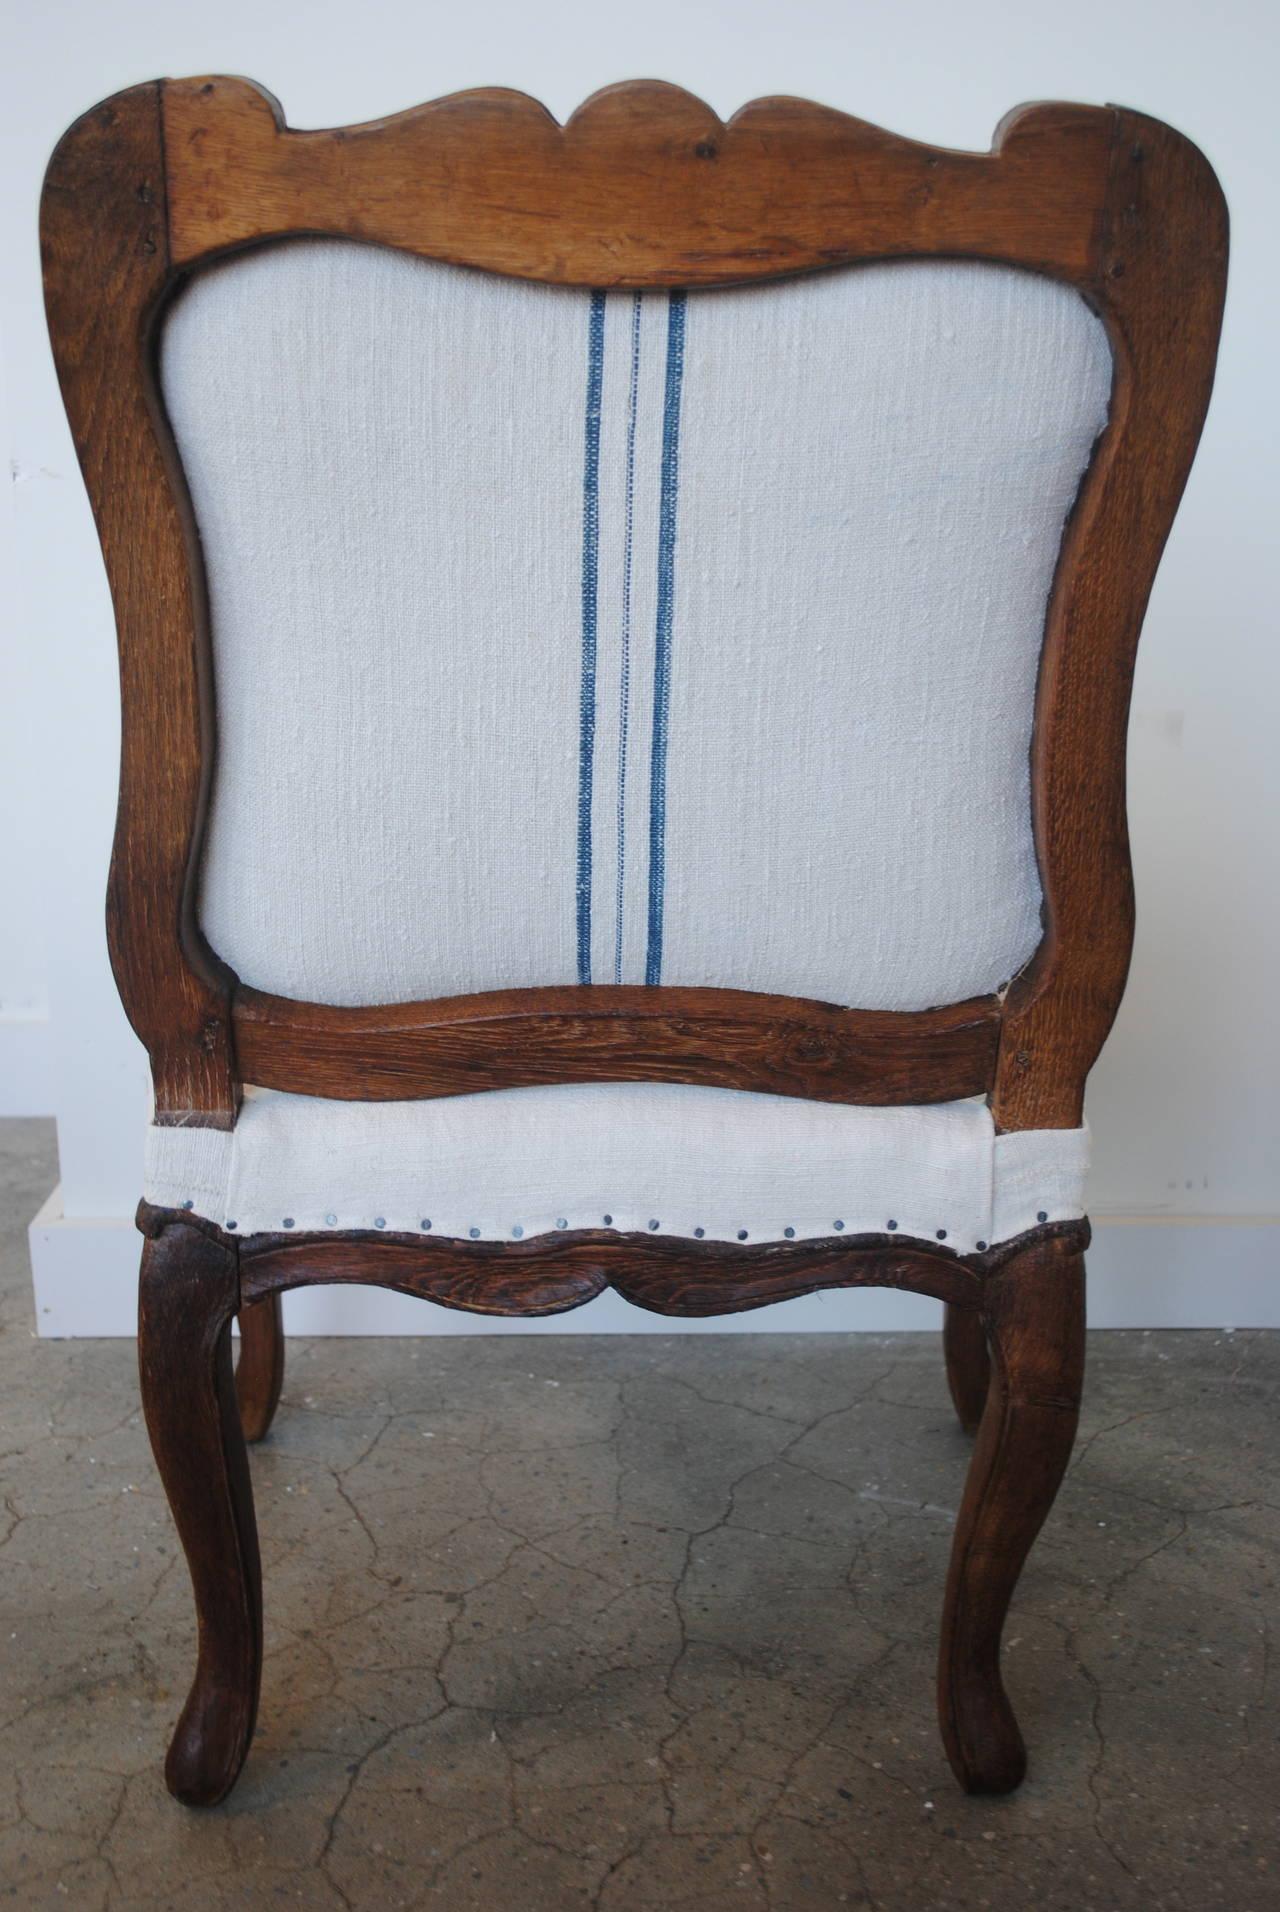 Pair of 19th Century Chestnut Slipper Chairs 8